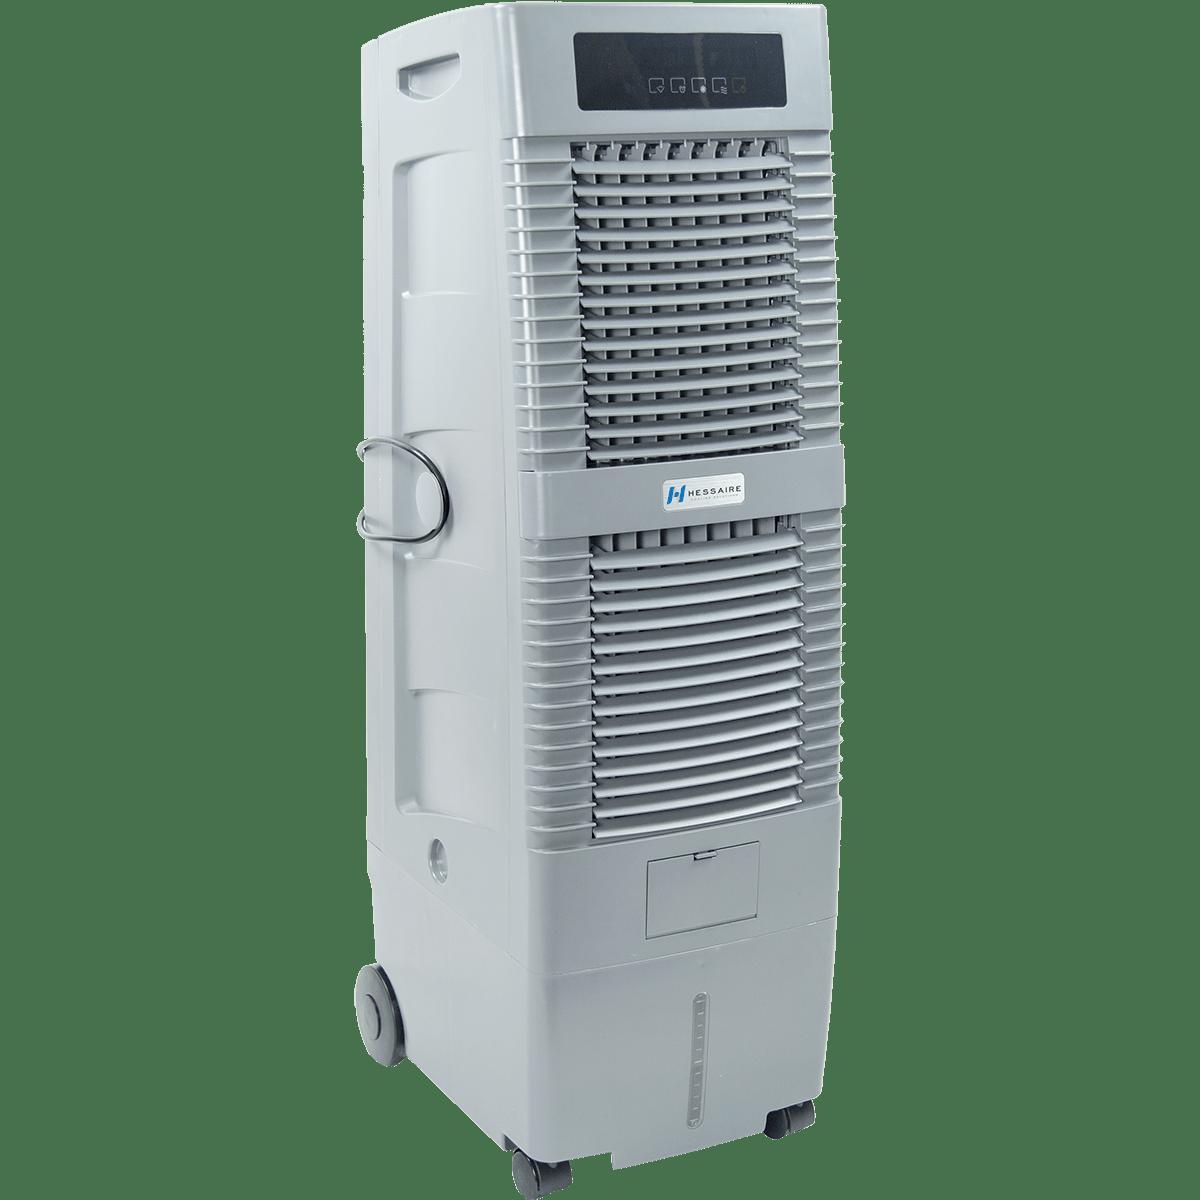 Hessaire MC21A 1,100 CFM Evaporative Cooler he6349